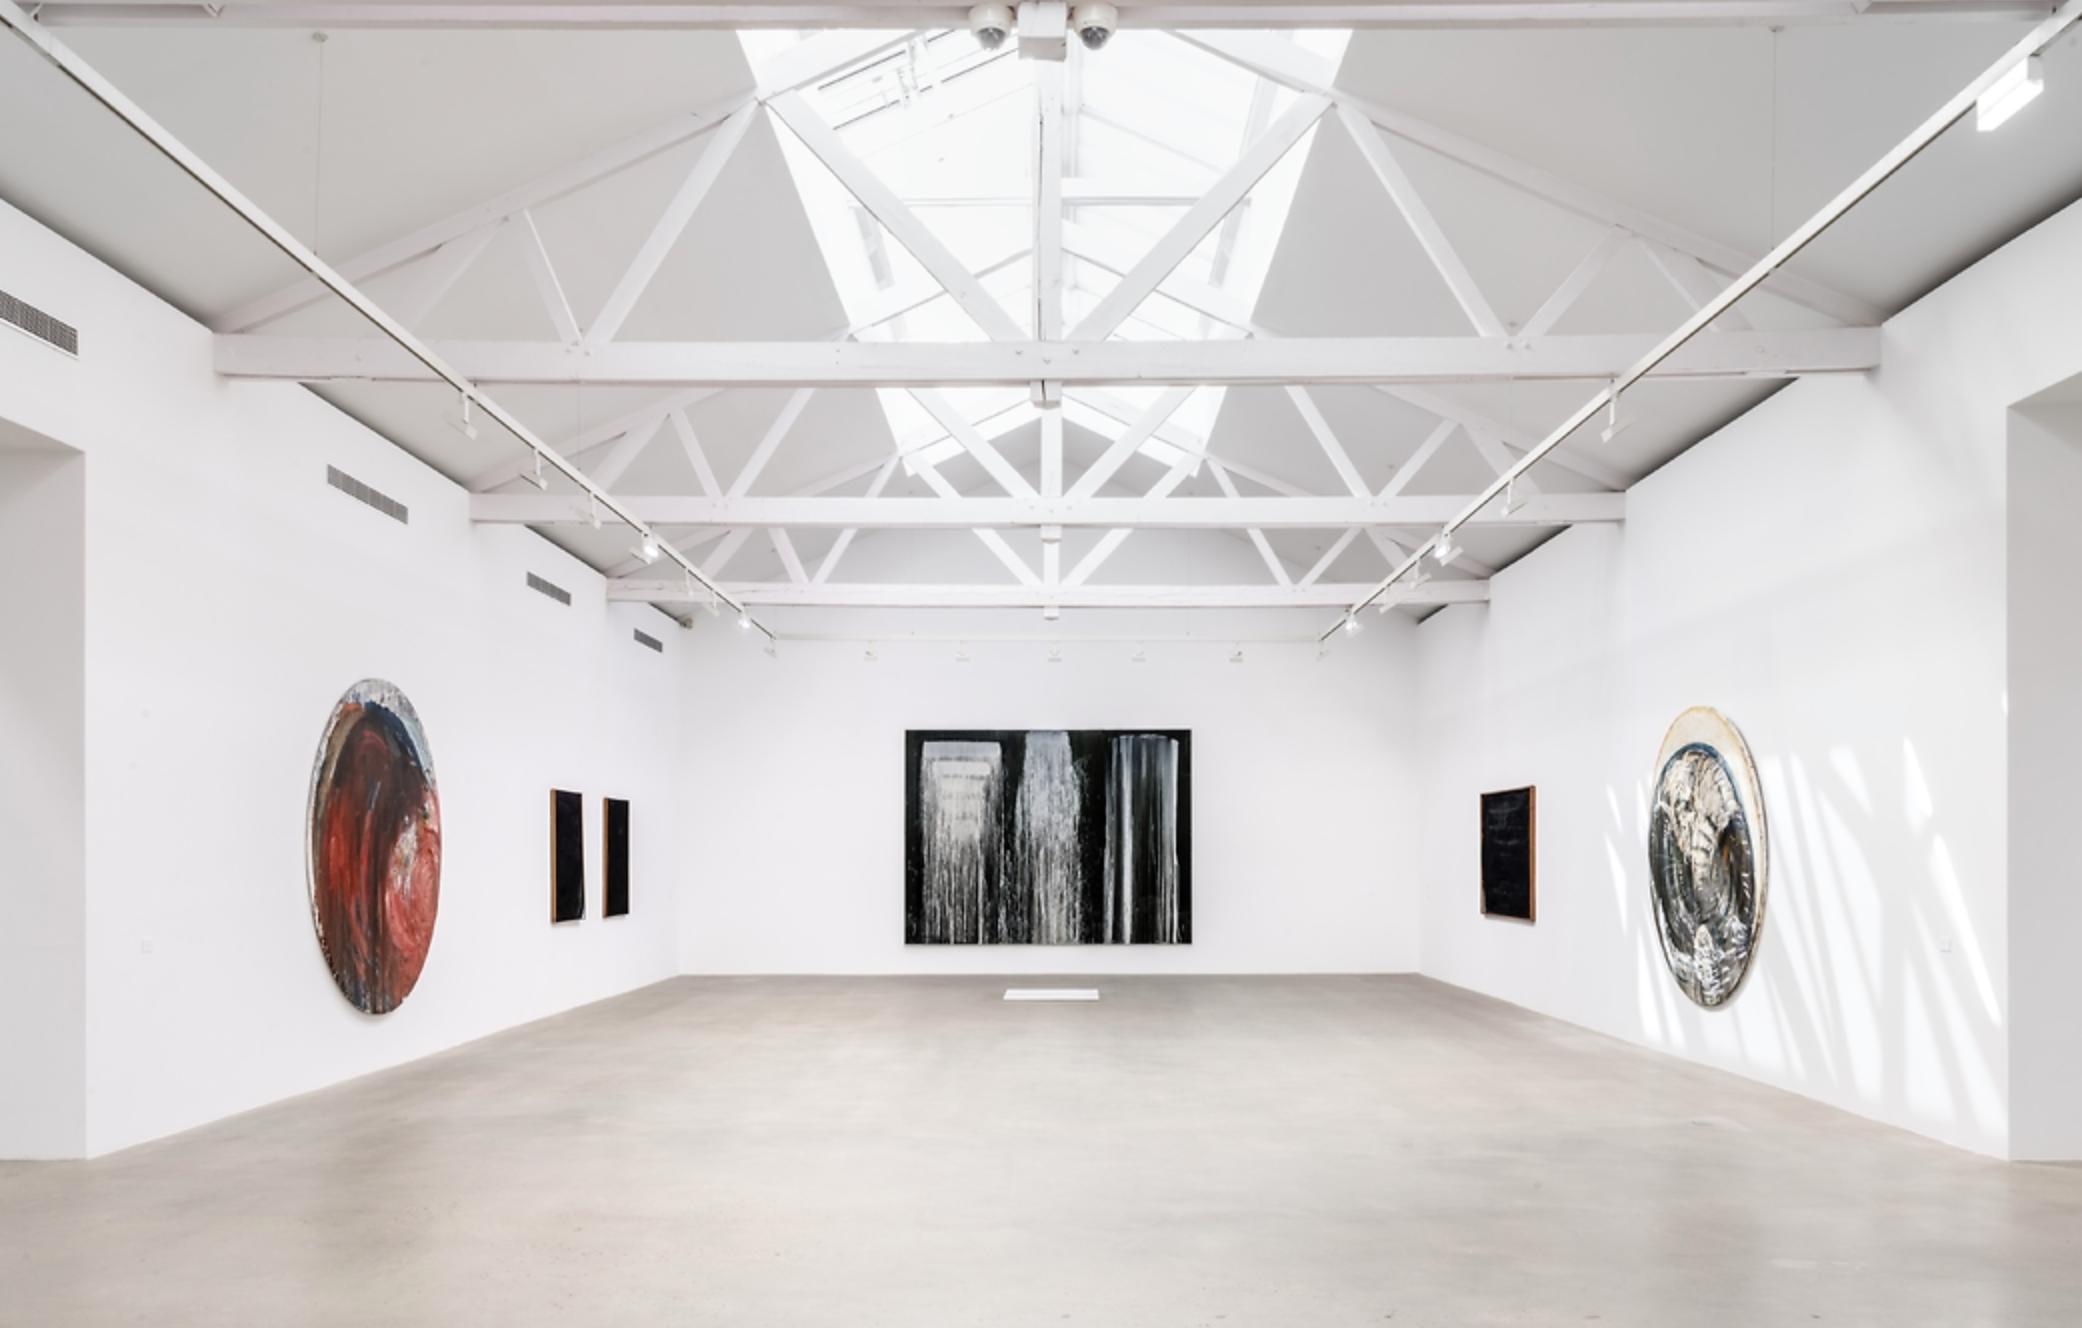 Vue de l'exposition It come in waves, Galerie Ropac Pantin